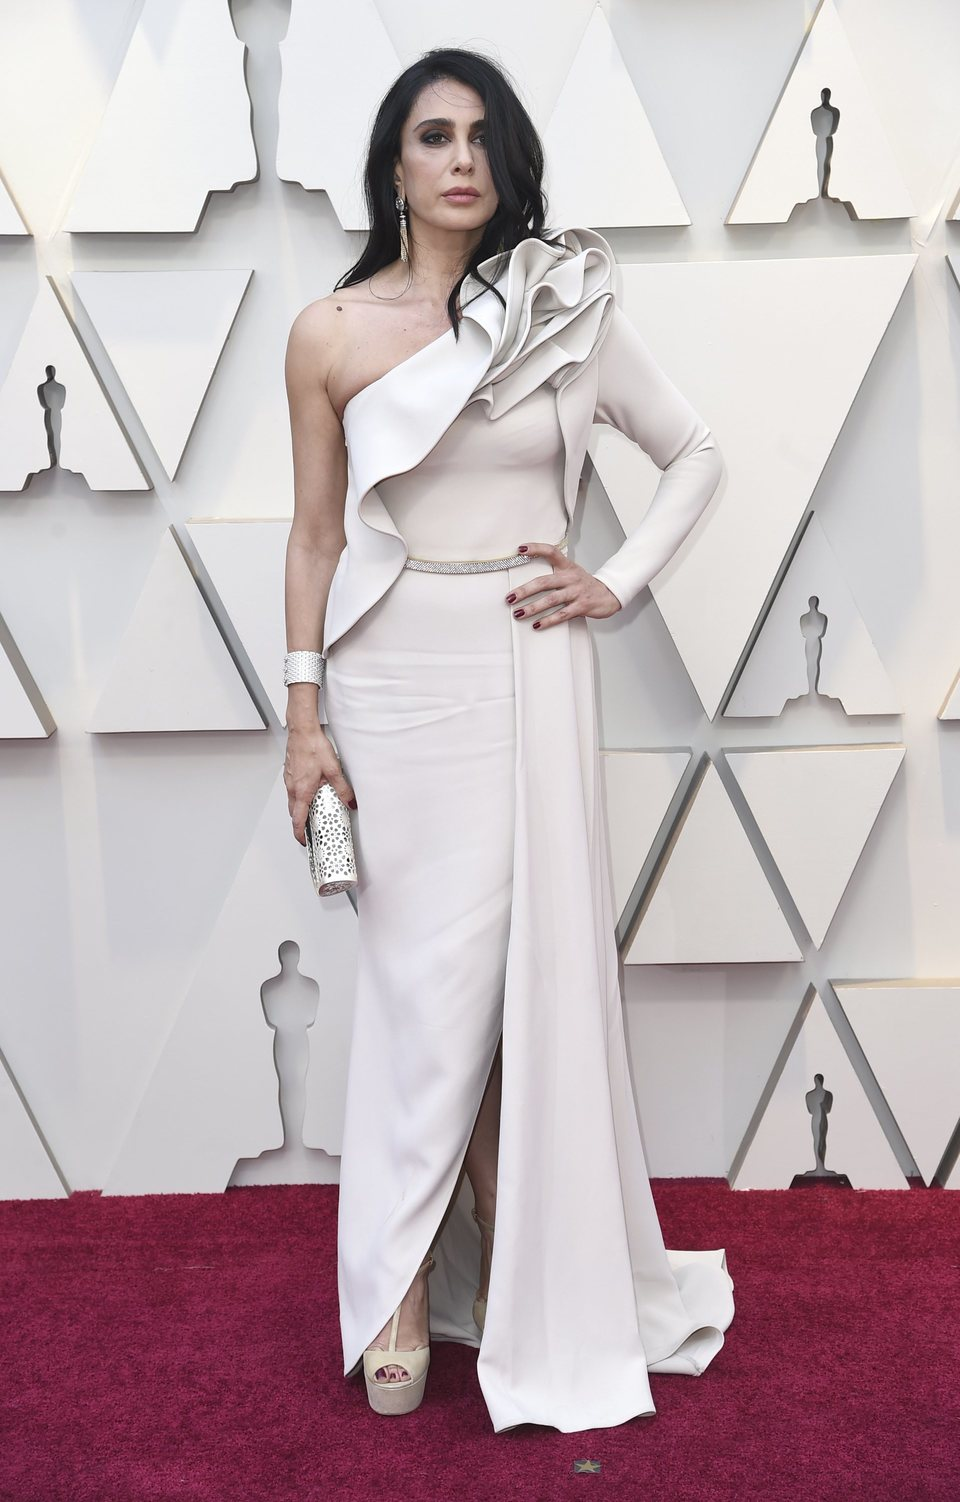 Nadine Labaki at the Oscars 2019 red carpet